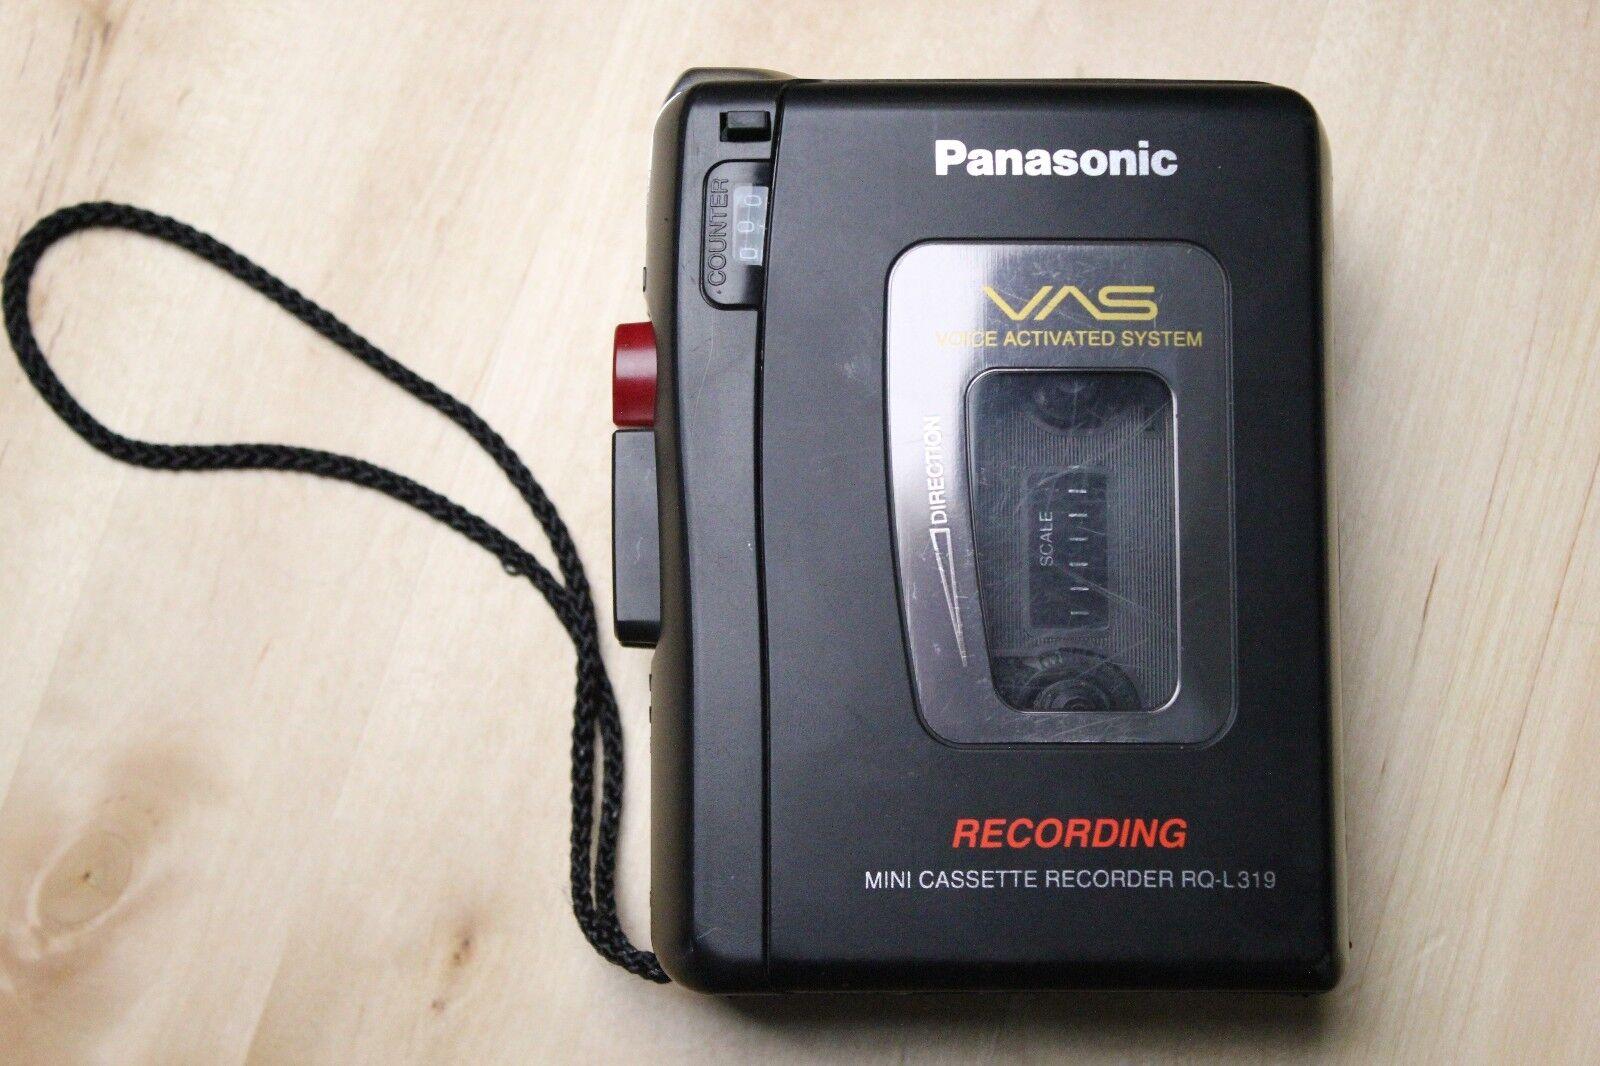 Panasonic Cassette Recorder RQ-L319 VAS Voice Activated System